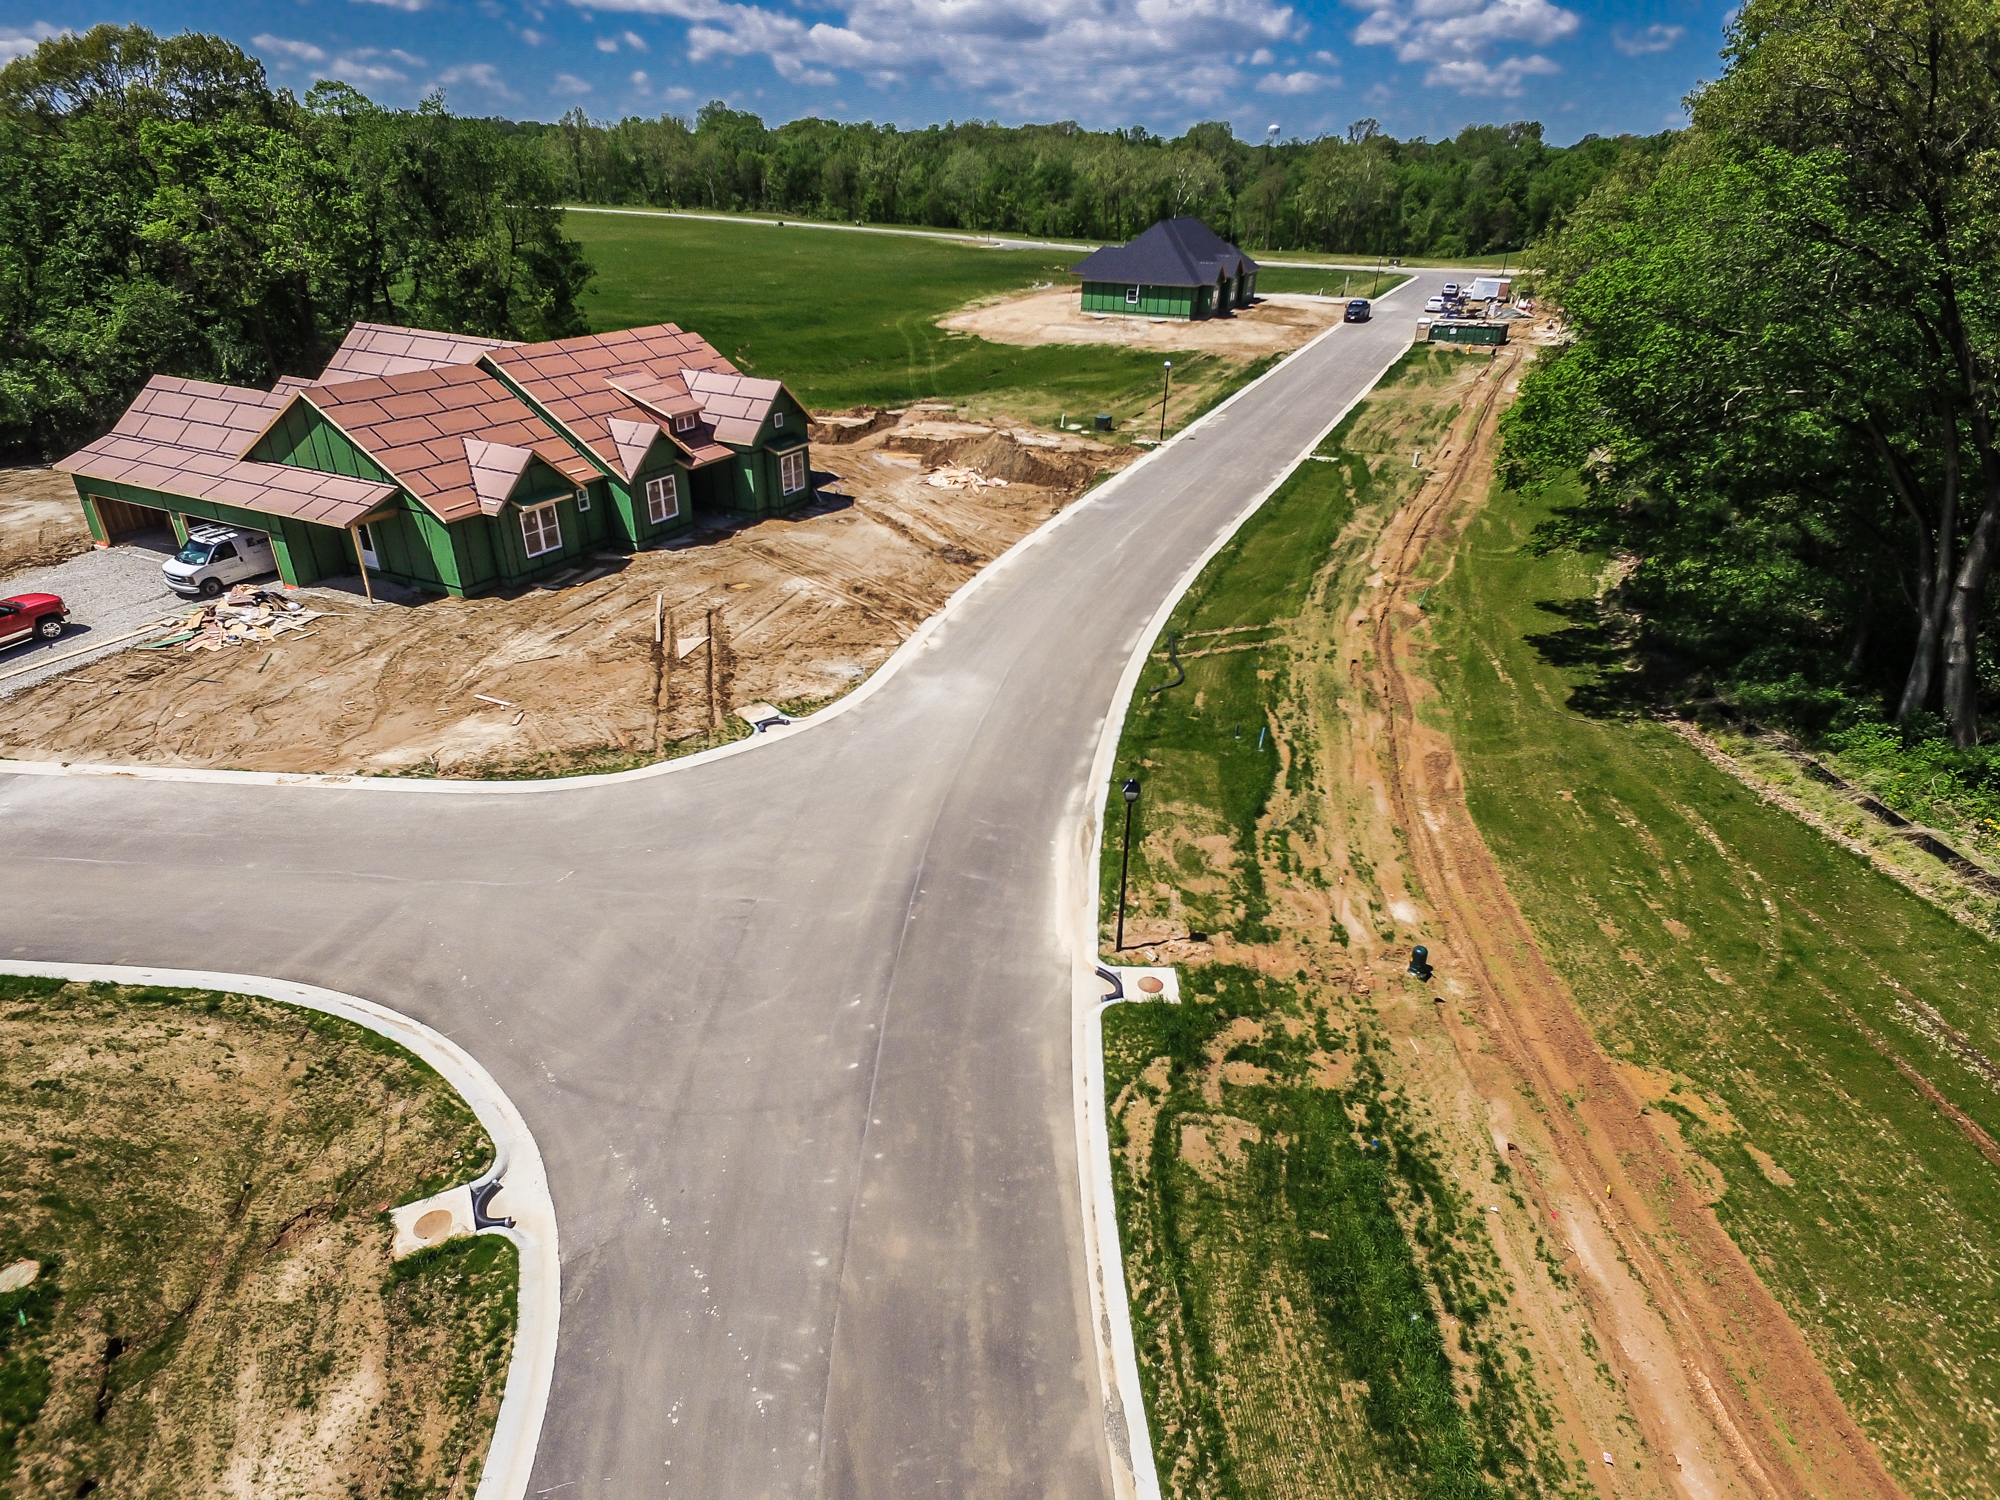 Bethel_Ridge_Farms_O'Fallon_Illinois_Aerials_Progress_5.3.17-9.jpg